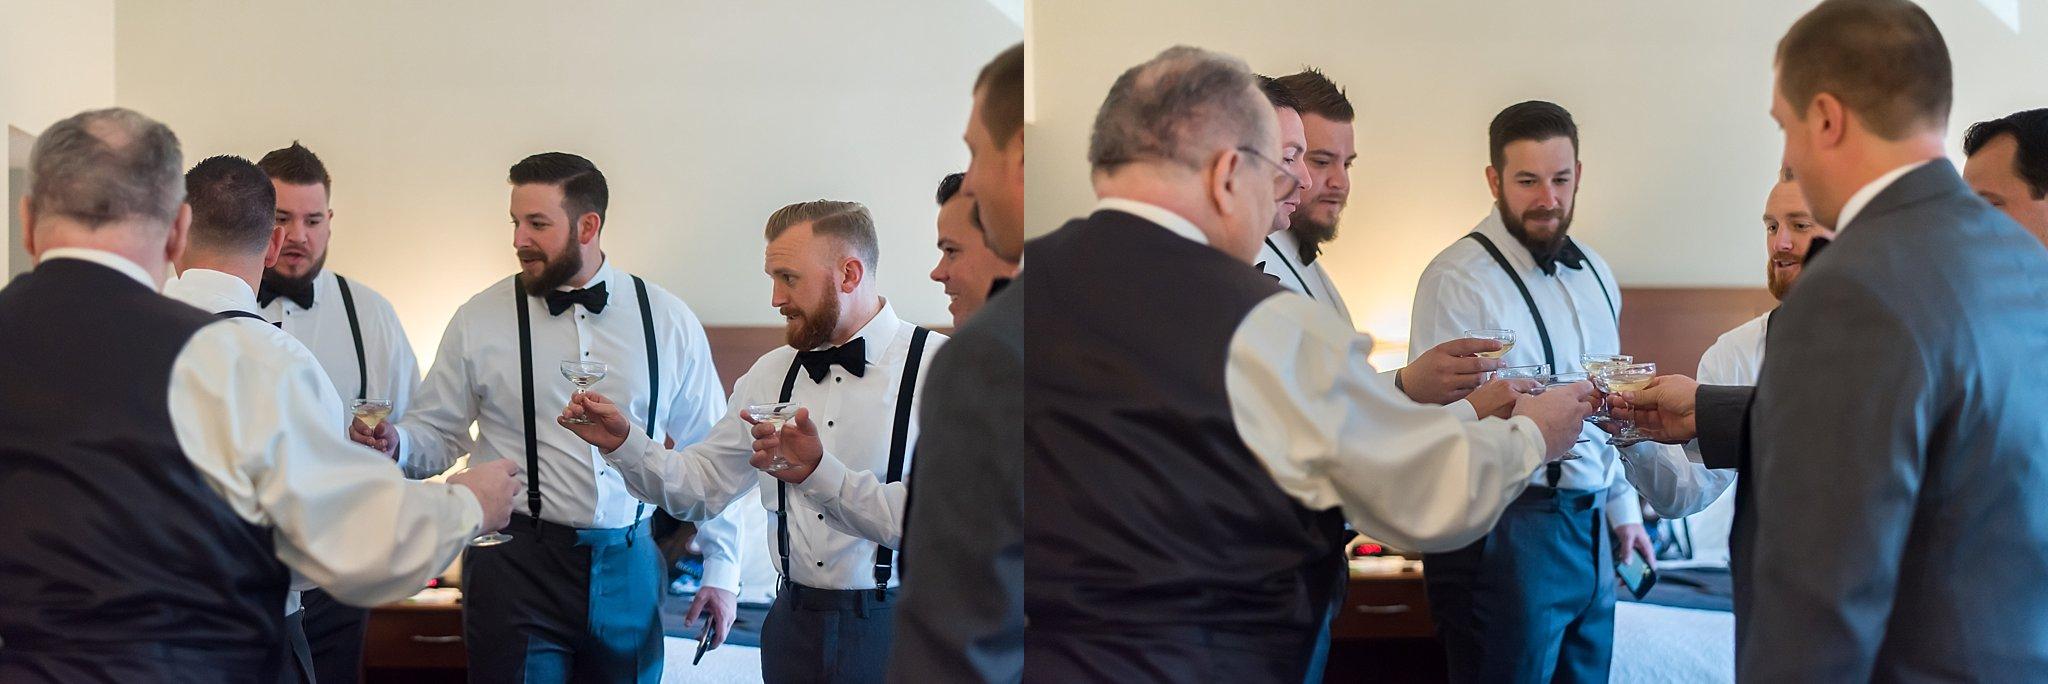 cape cod wedding photograper.jpg